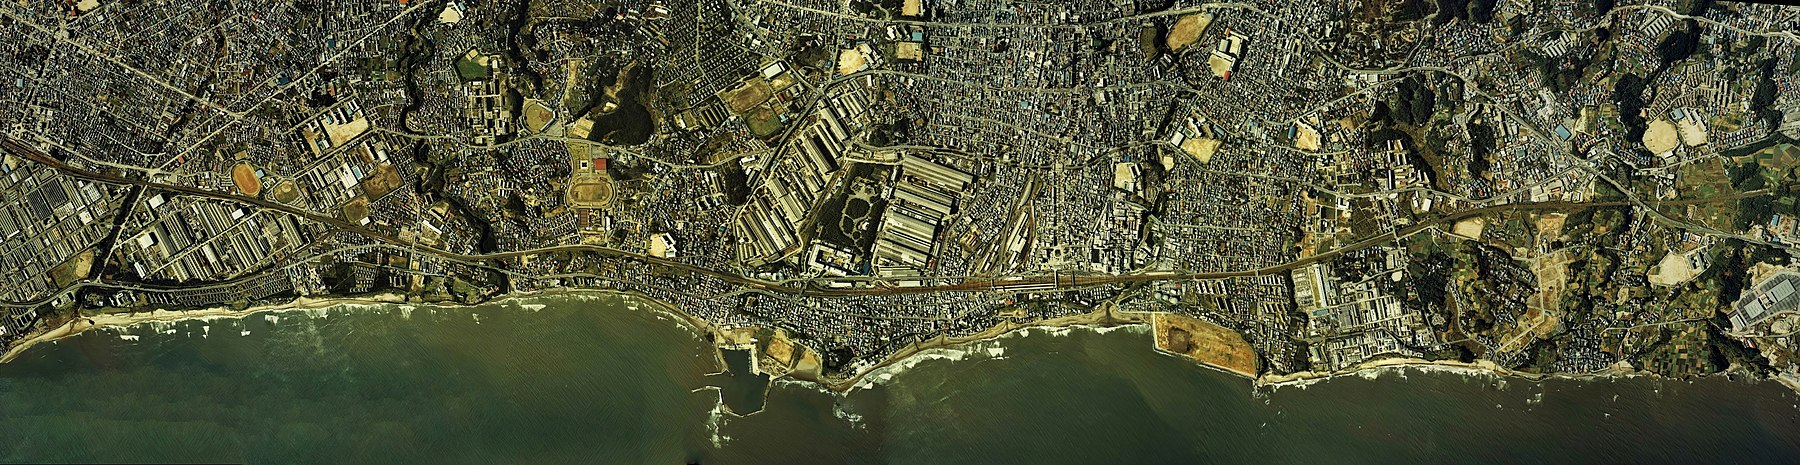 Coastline of Hitachi city center area Aerial photograph.1980.jpg